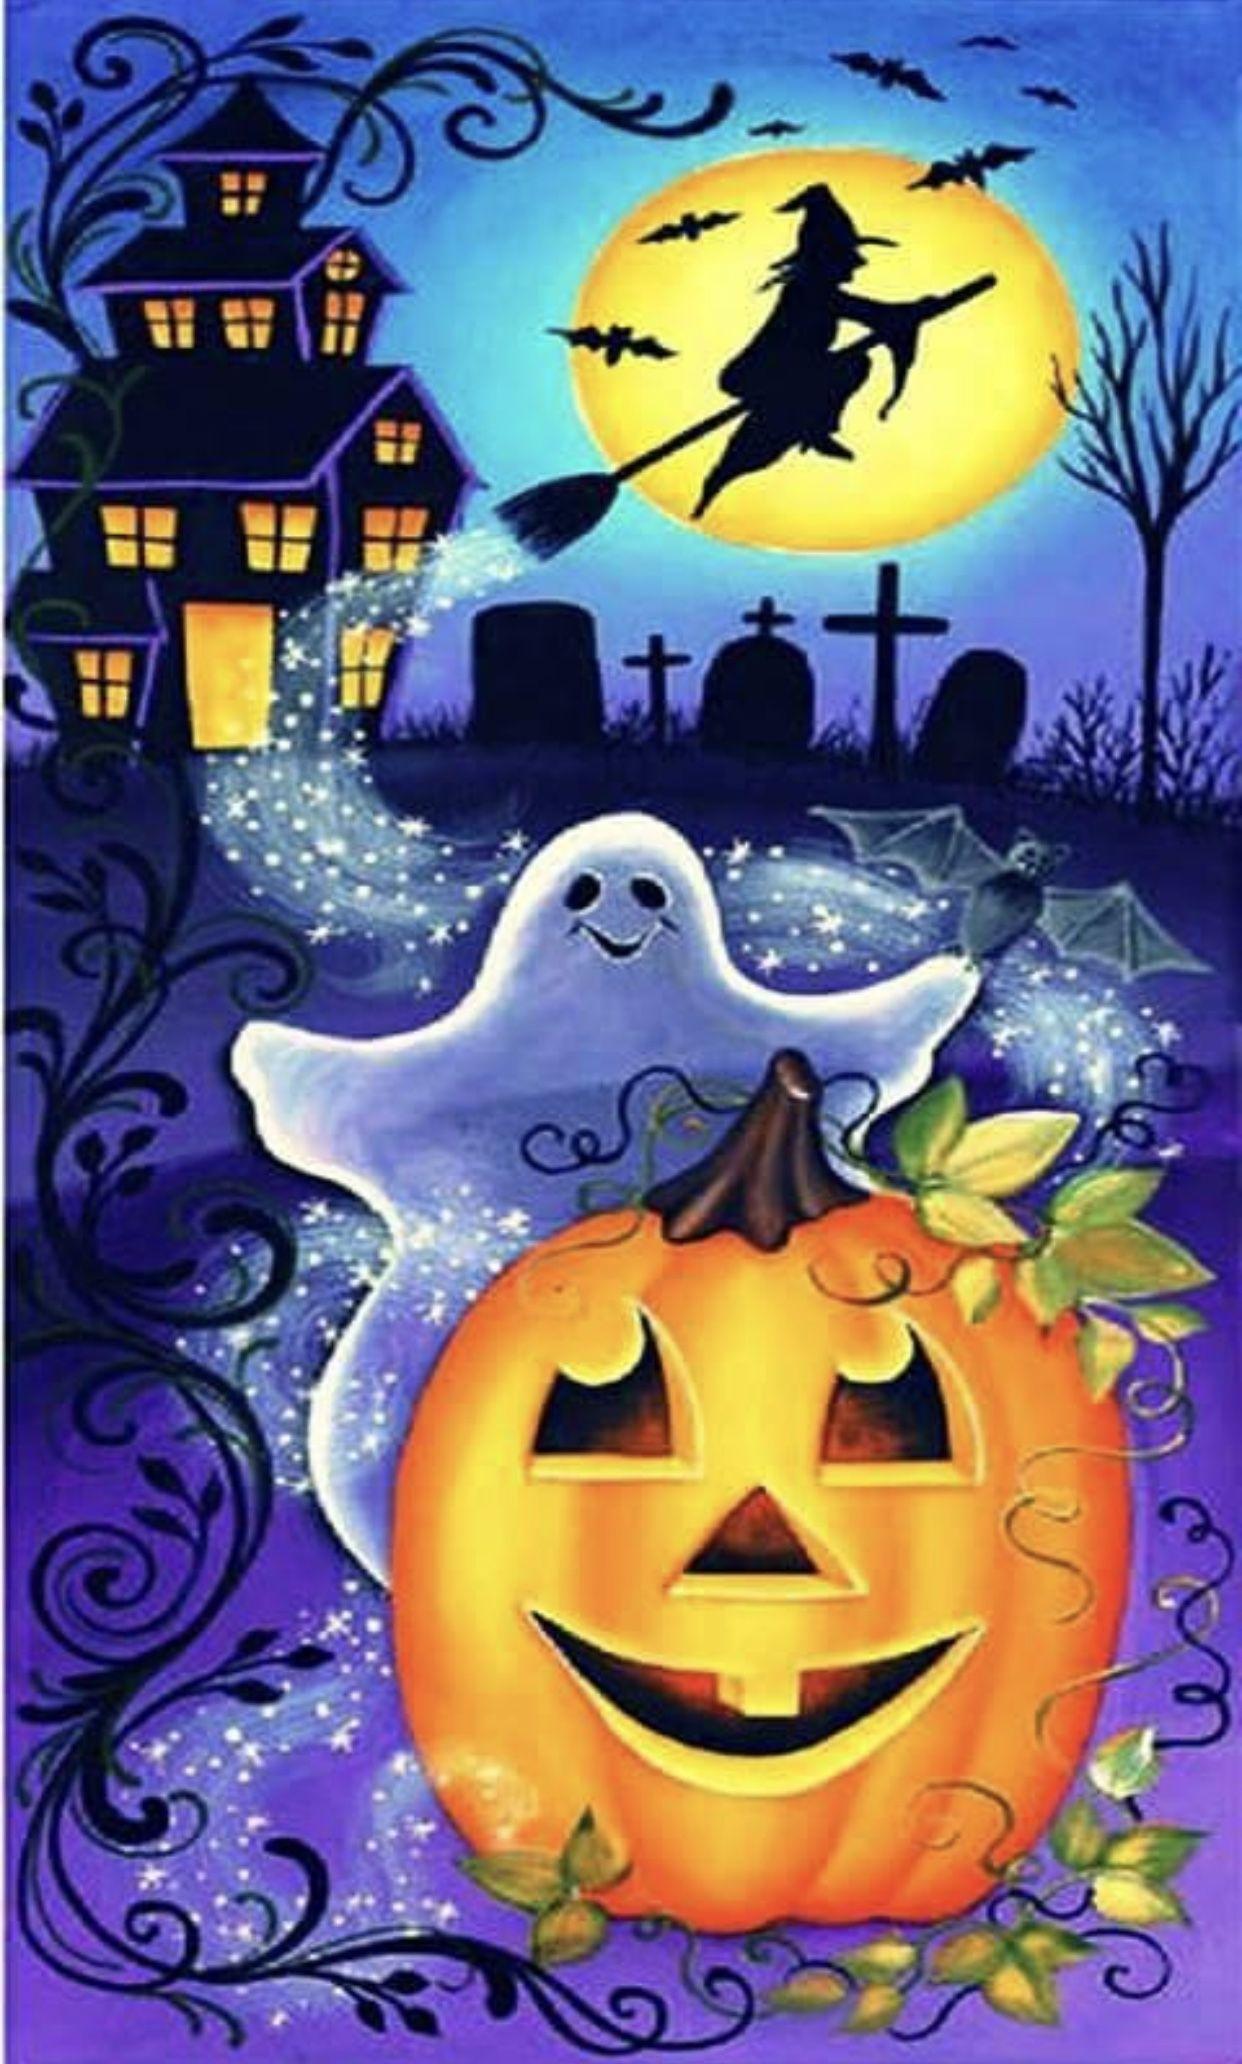 Pin By Renee Dipiazza On Stuff To Buy Halloween Canvas Halloween Painting Halloween Prints